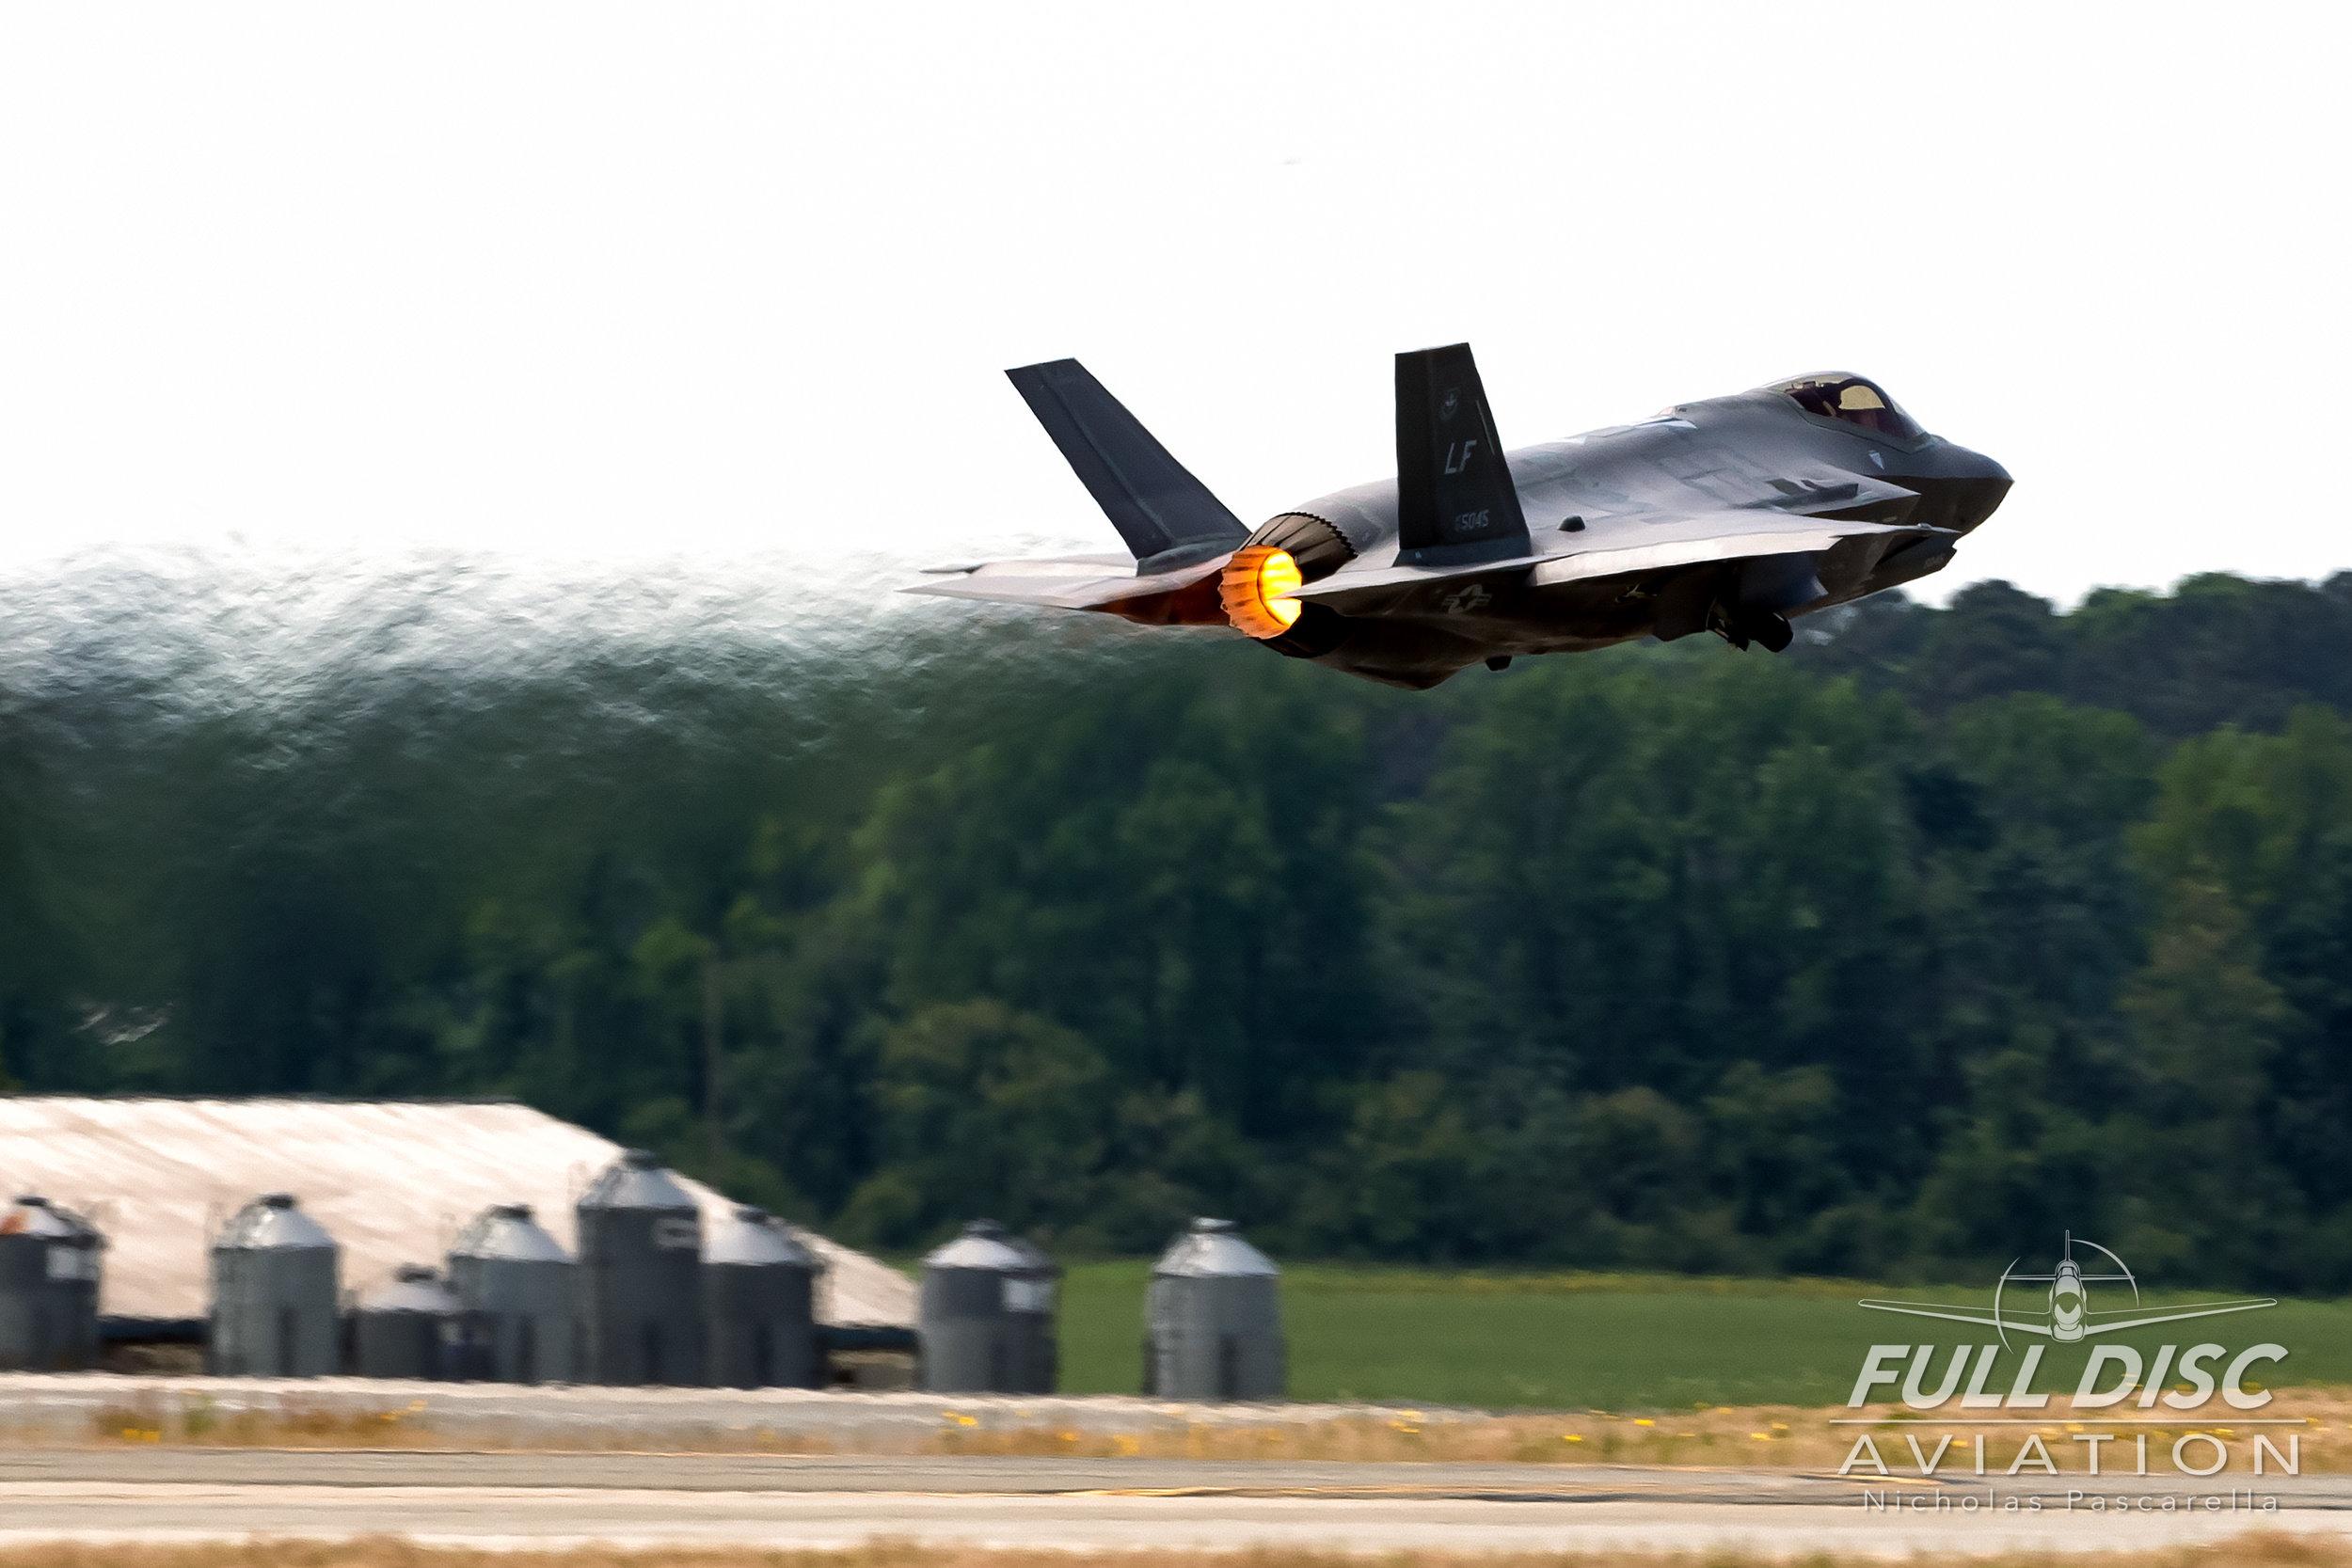 f35_afterburner_takeoff_nickpascarella_fulldiscaviation_nicholaspascarella_dojo.jpg